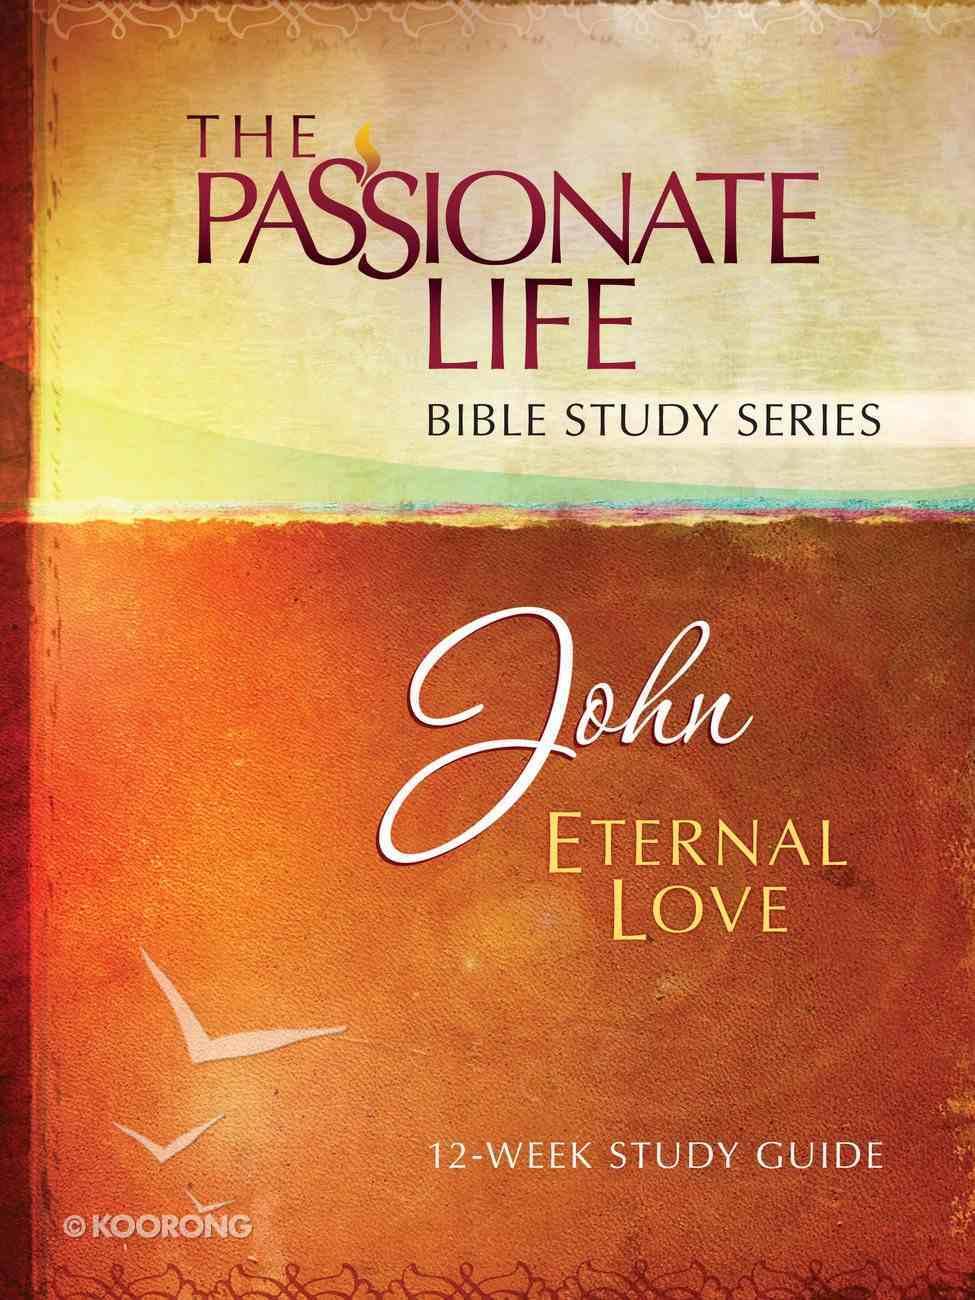 John - Eternal Love (The Passionate Life Bible Study Series) eBook